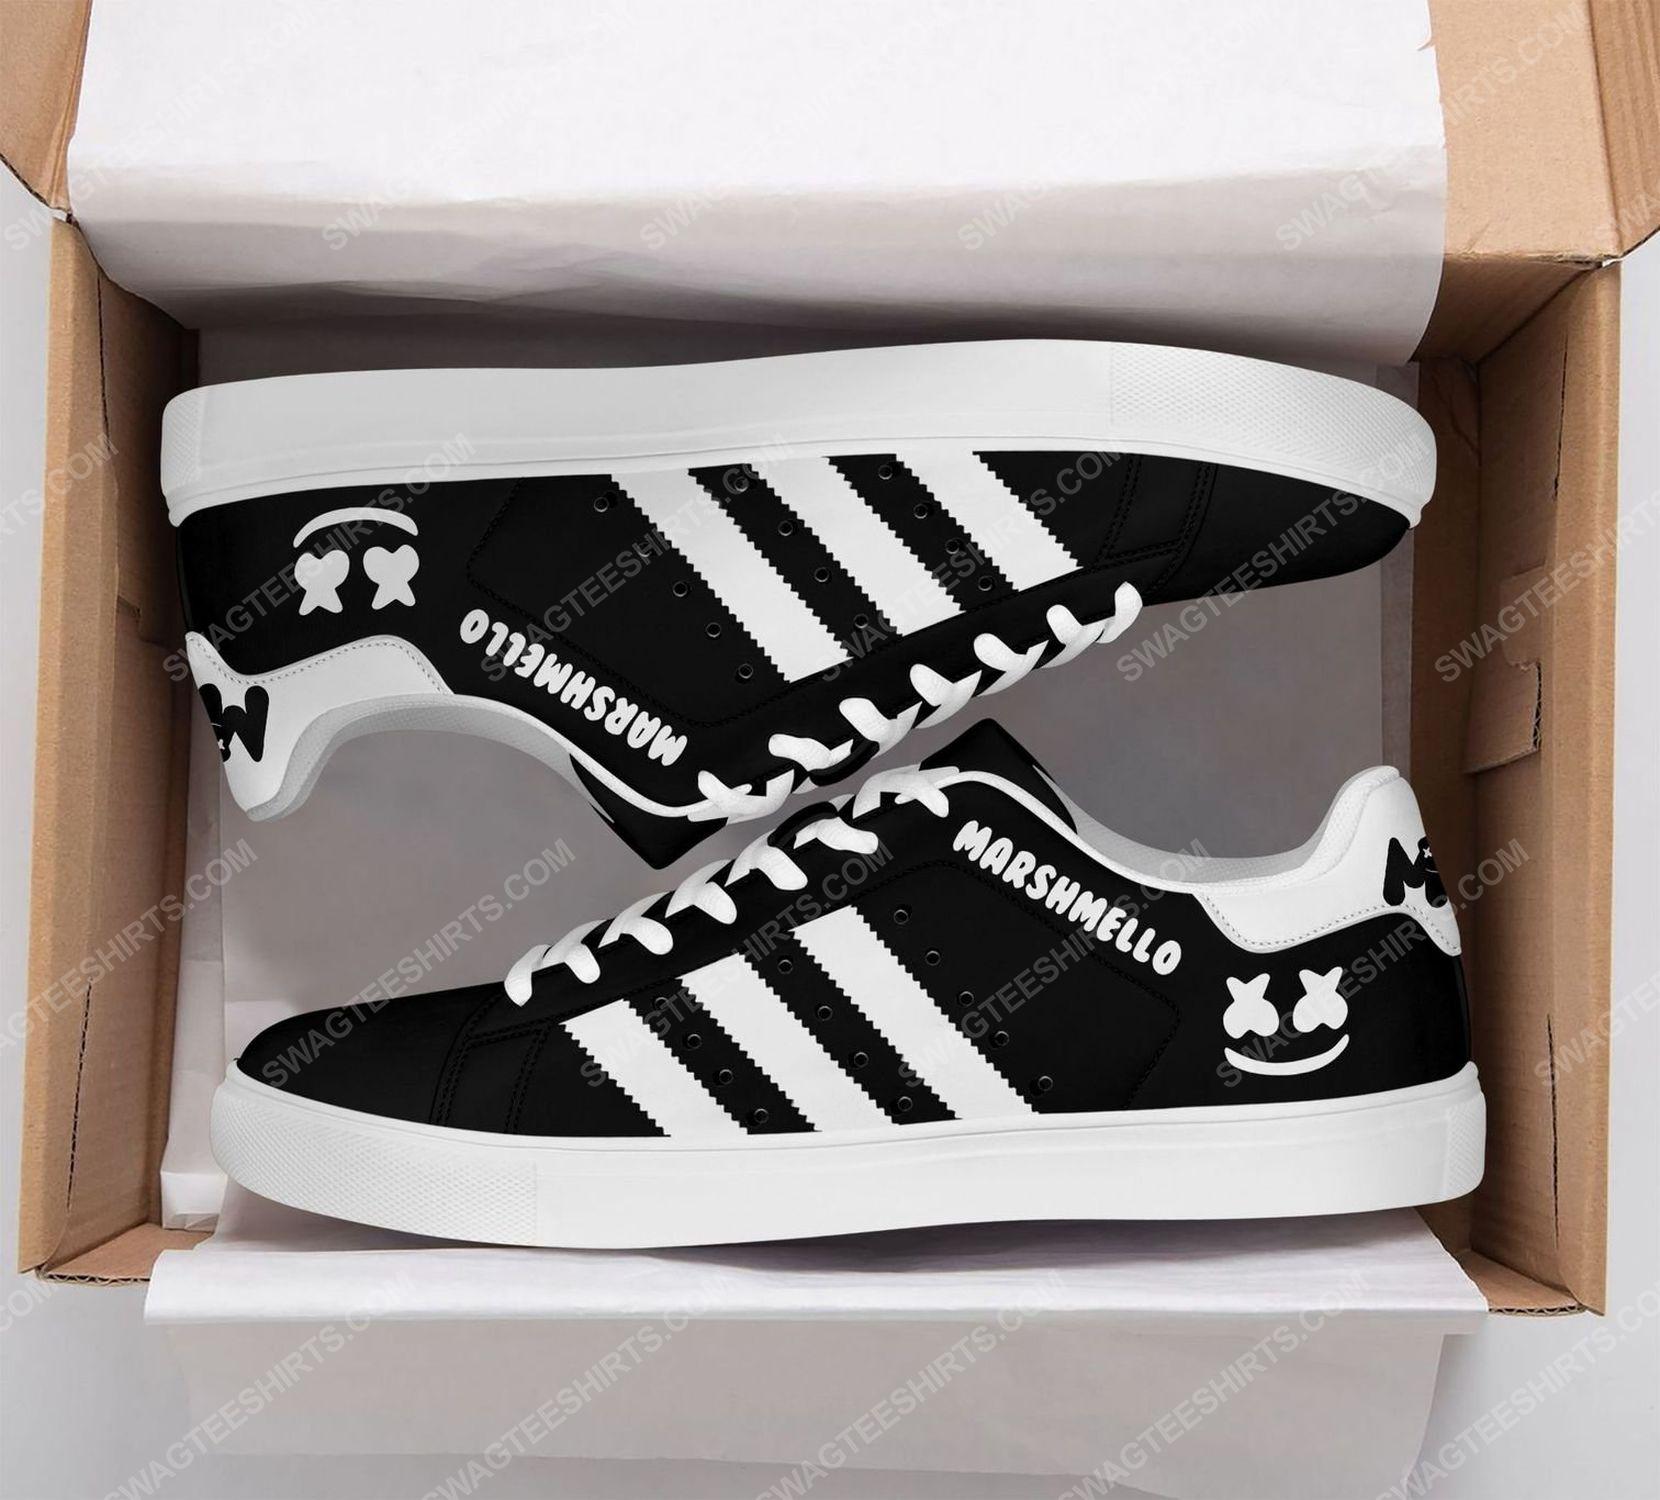 Marshmello american electronic music stan smith shoes 2